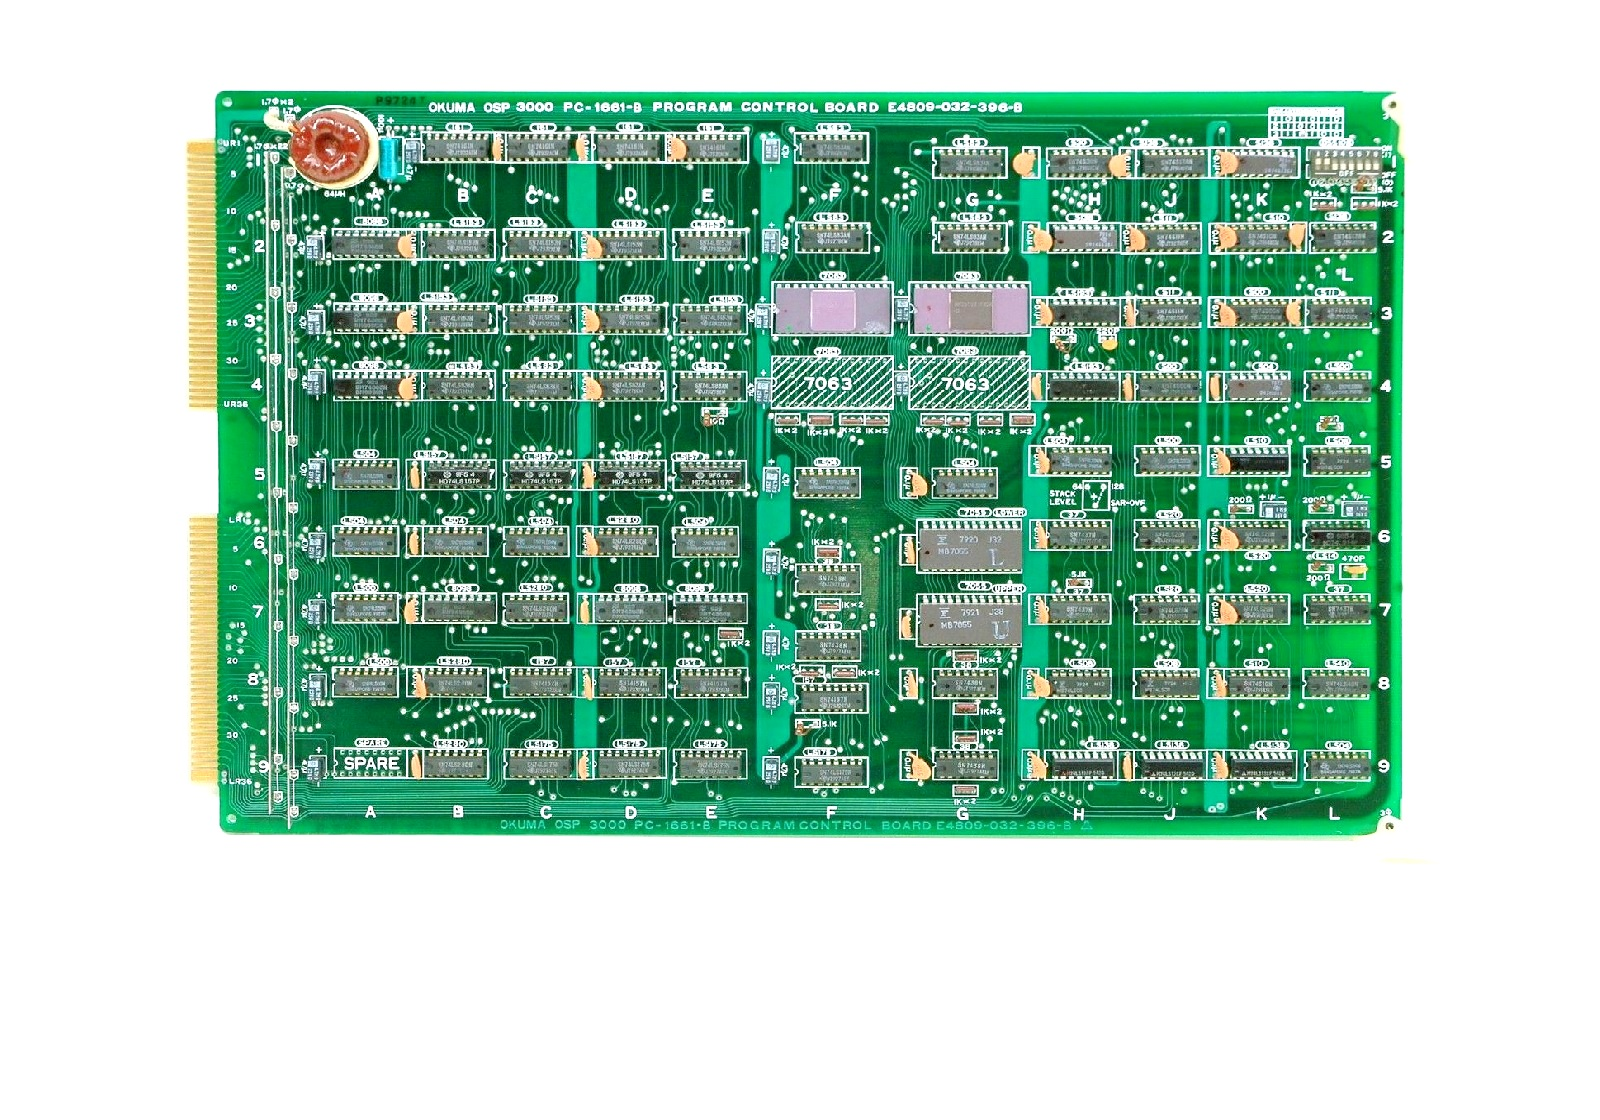 E4809-032 Circuit and Control Boards